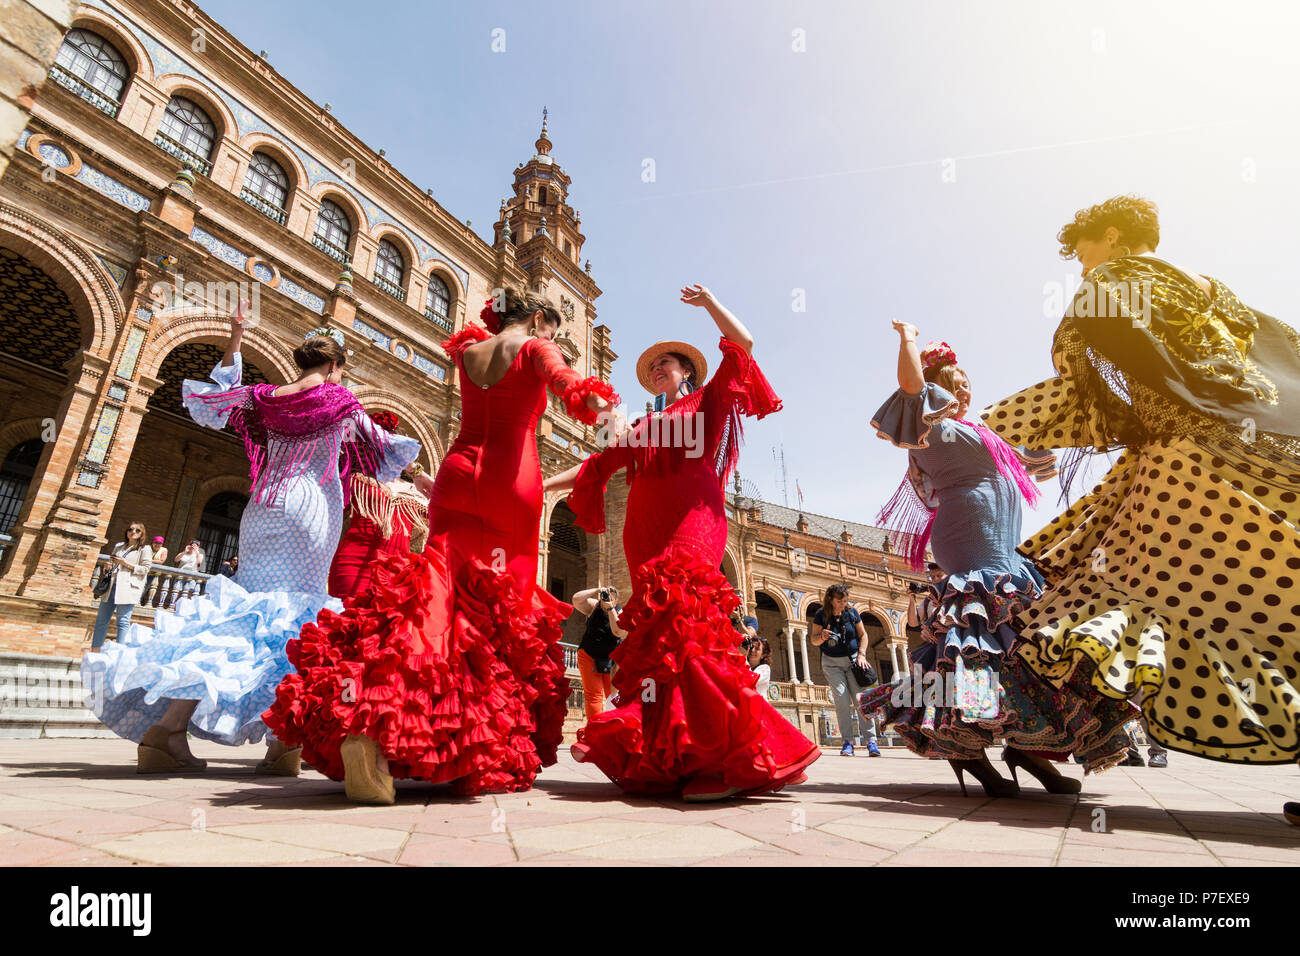 SEVILLE, SPAIN - MAY 2017: Young women dance flamenco on Plaza de Espana during famous Feria festival - Stock Image